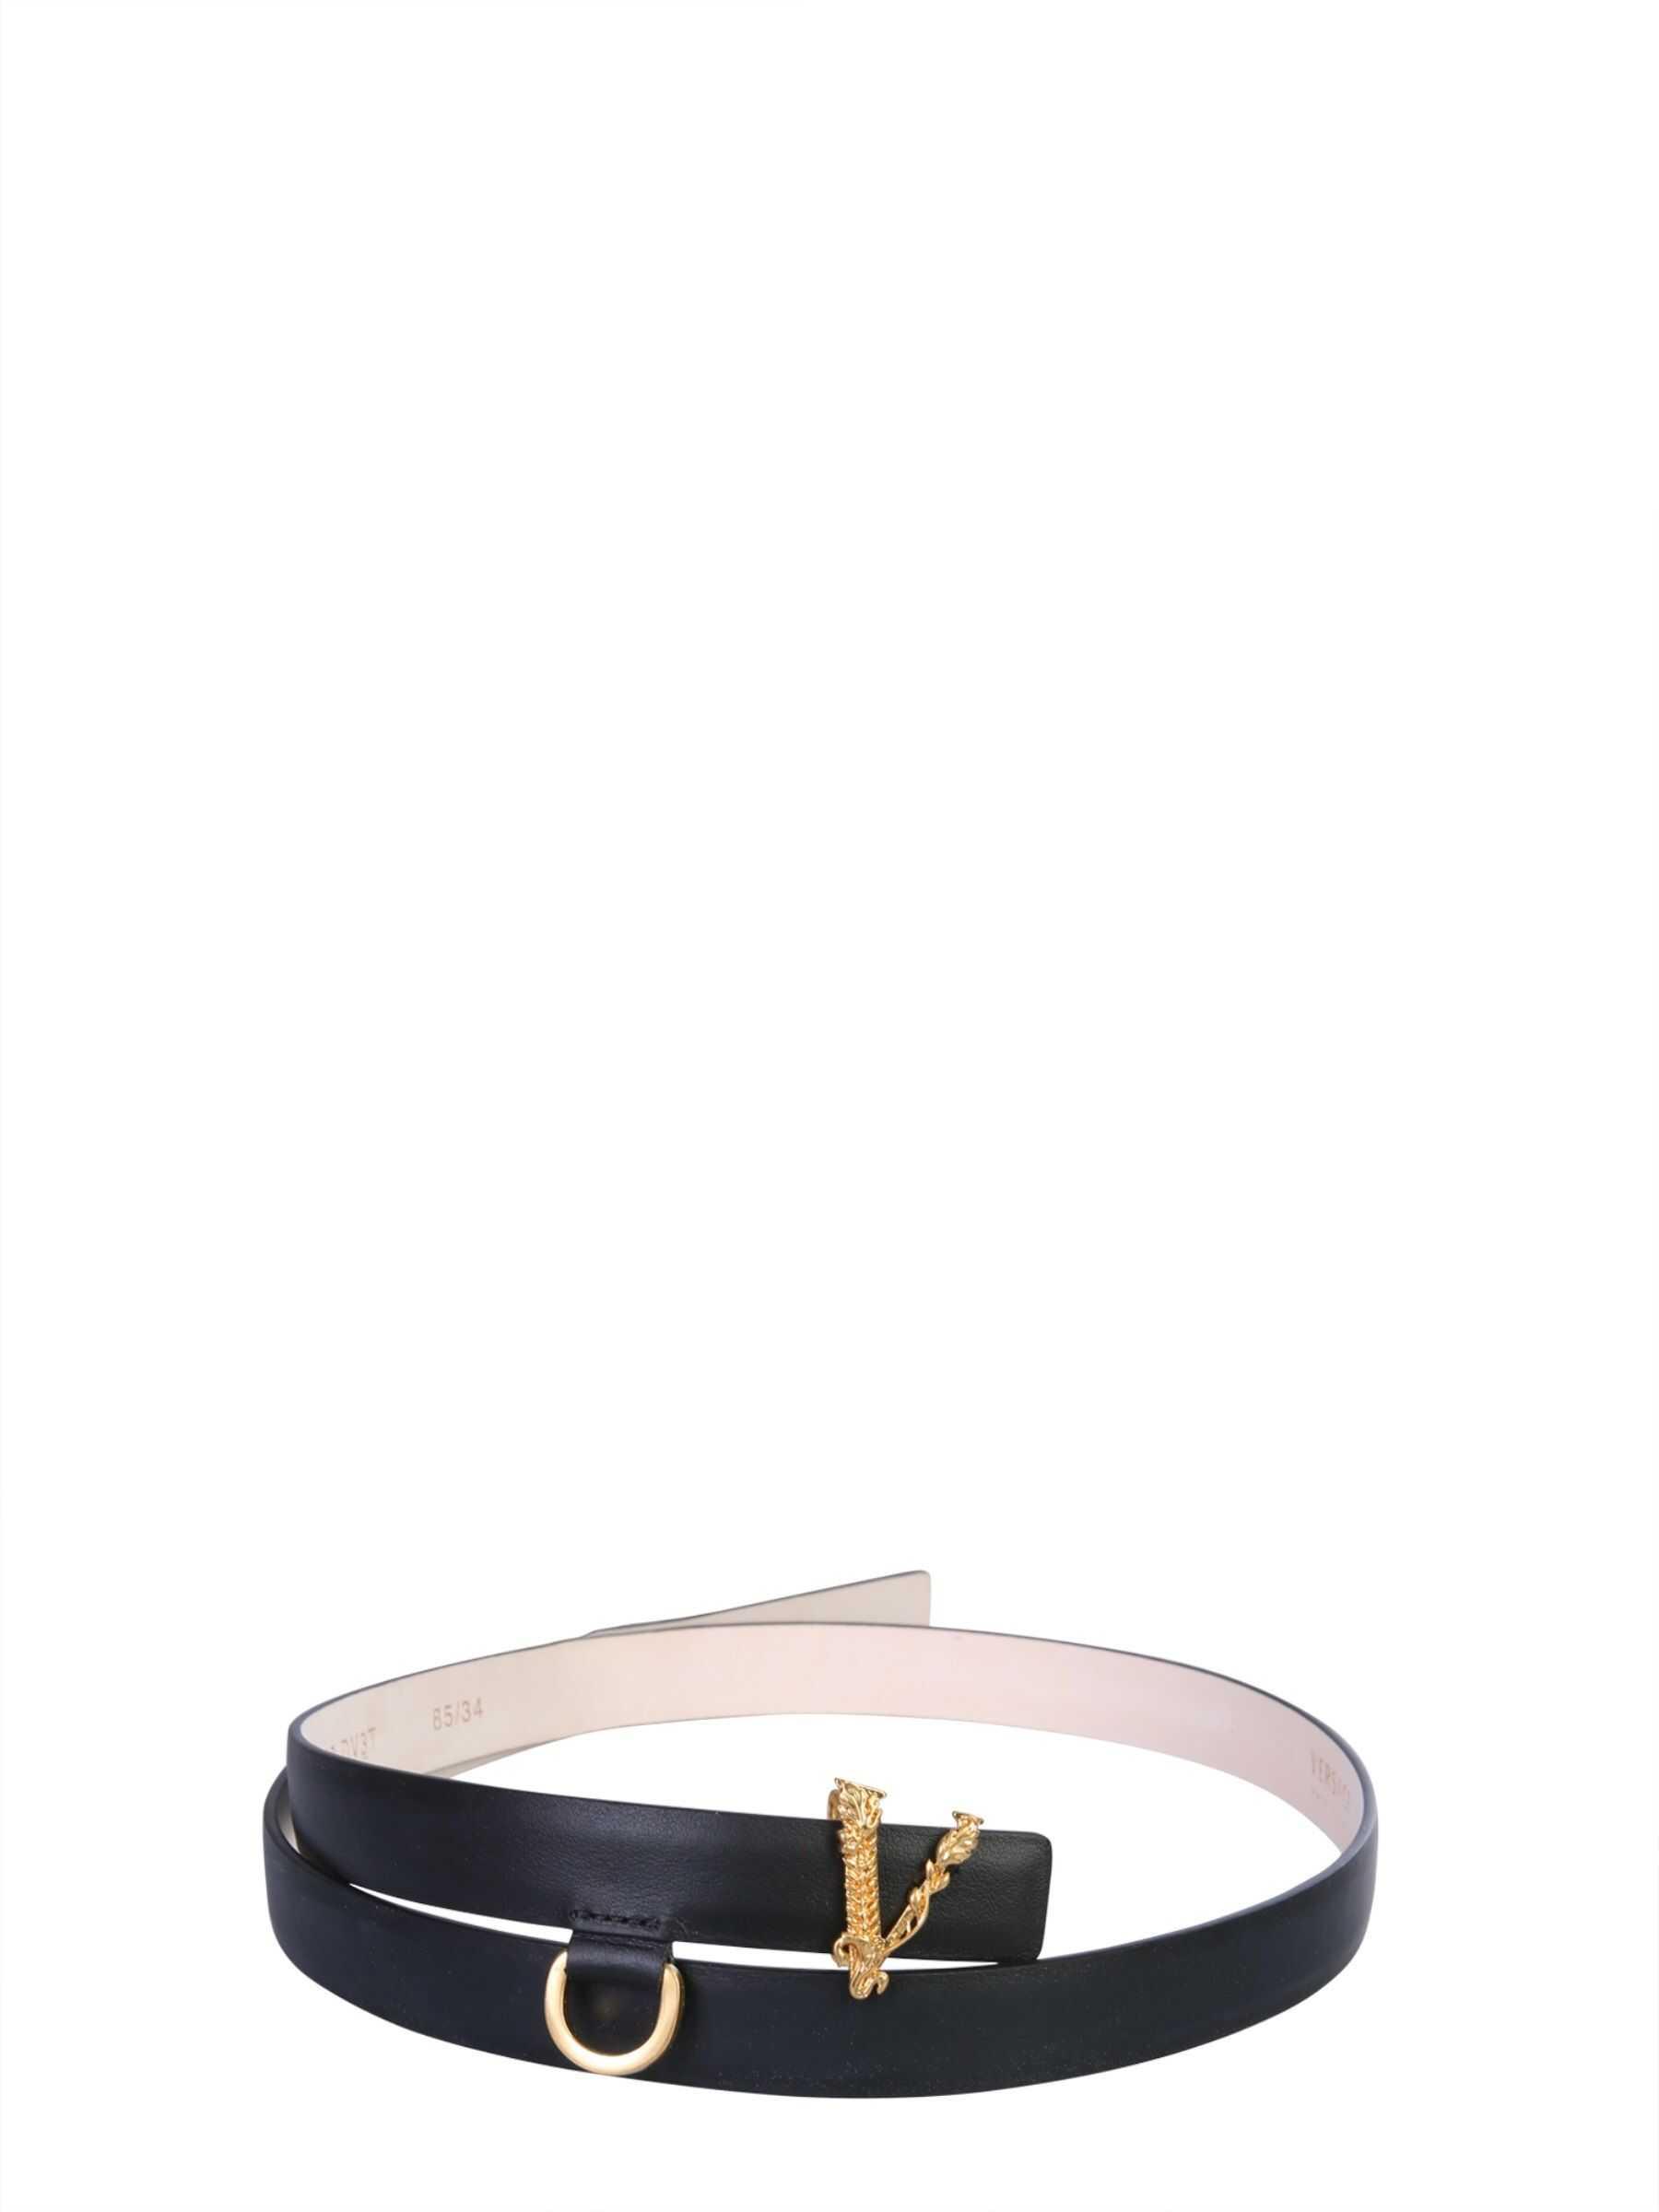 Versace Virtus Belt BLACK